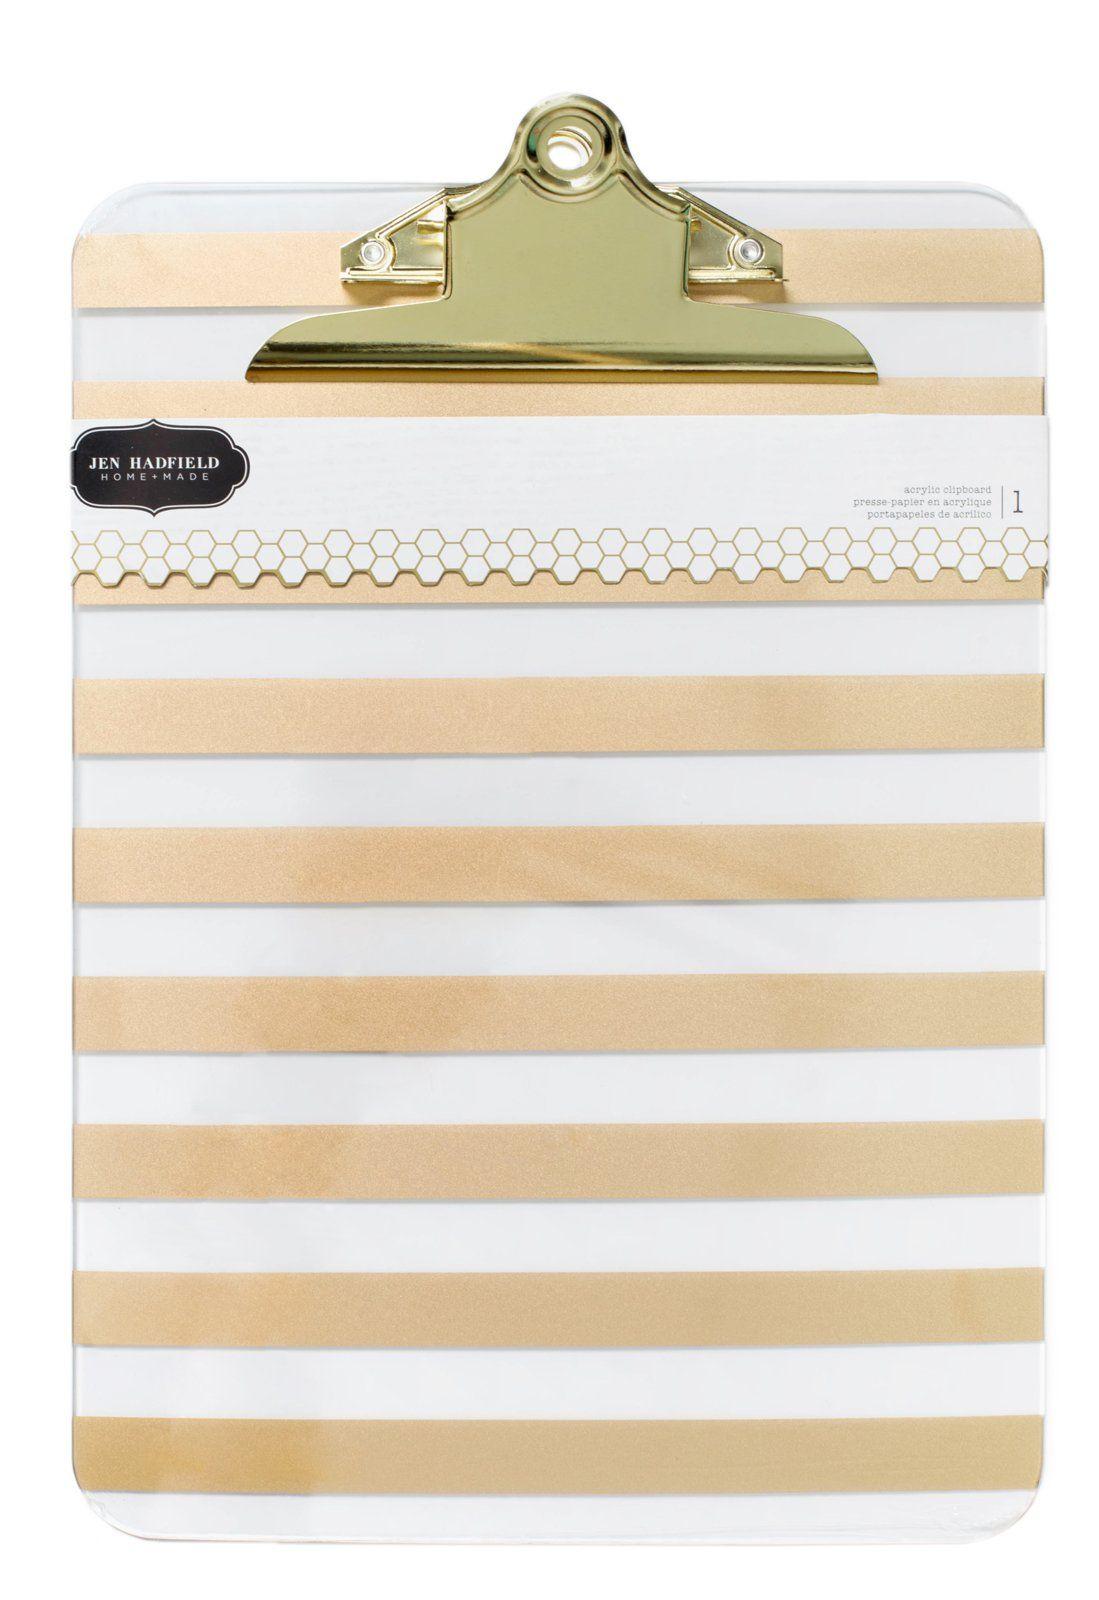 American Crafts Jen Hadfield DIY Home Gold Foil Acrylic Clipboard